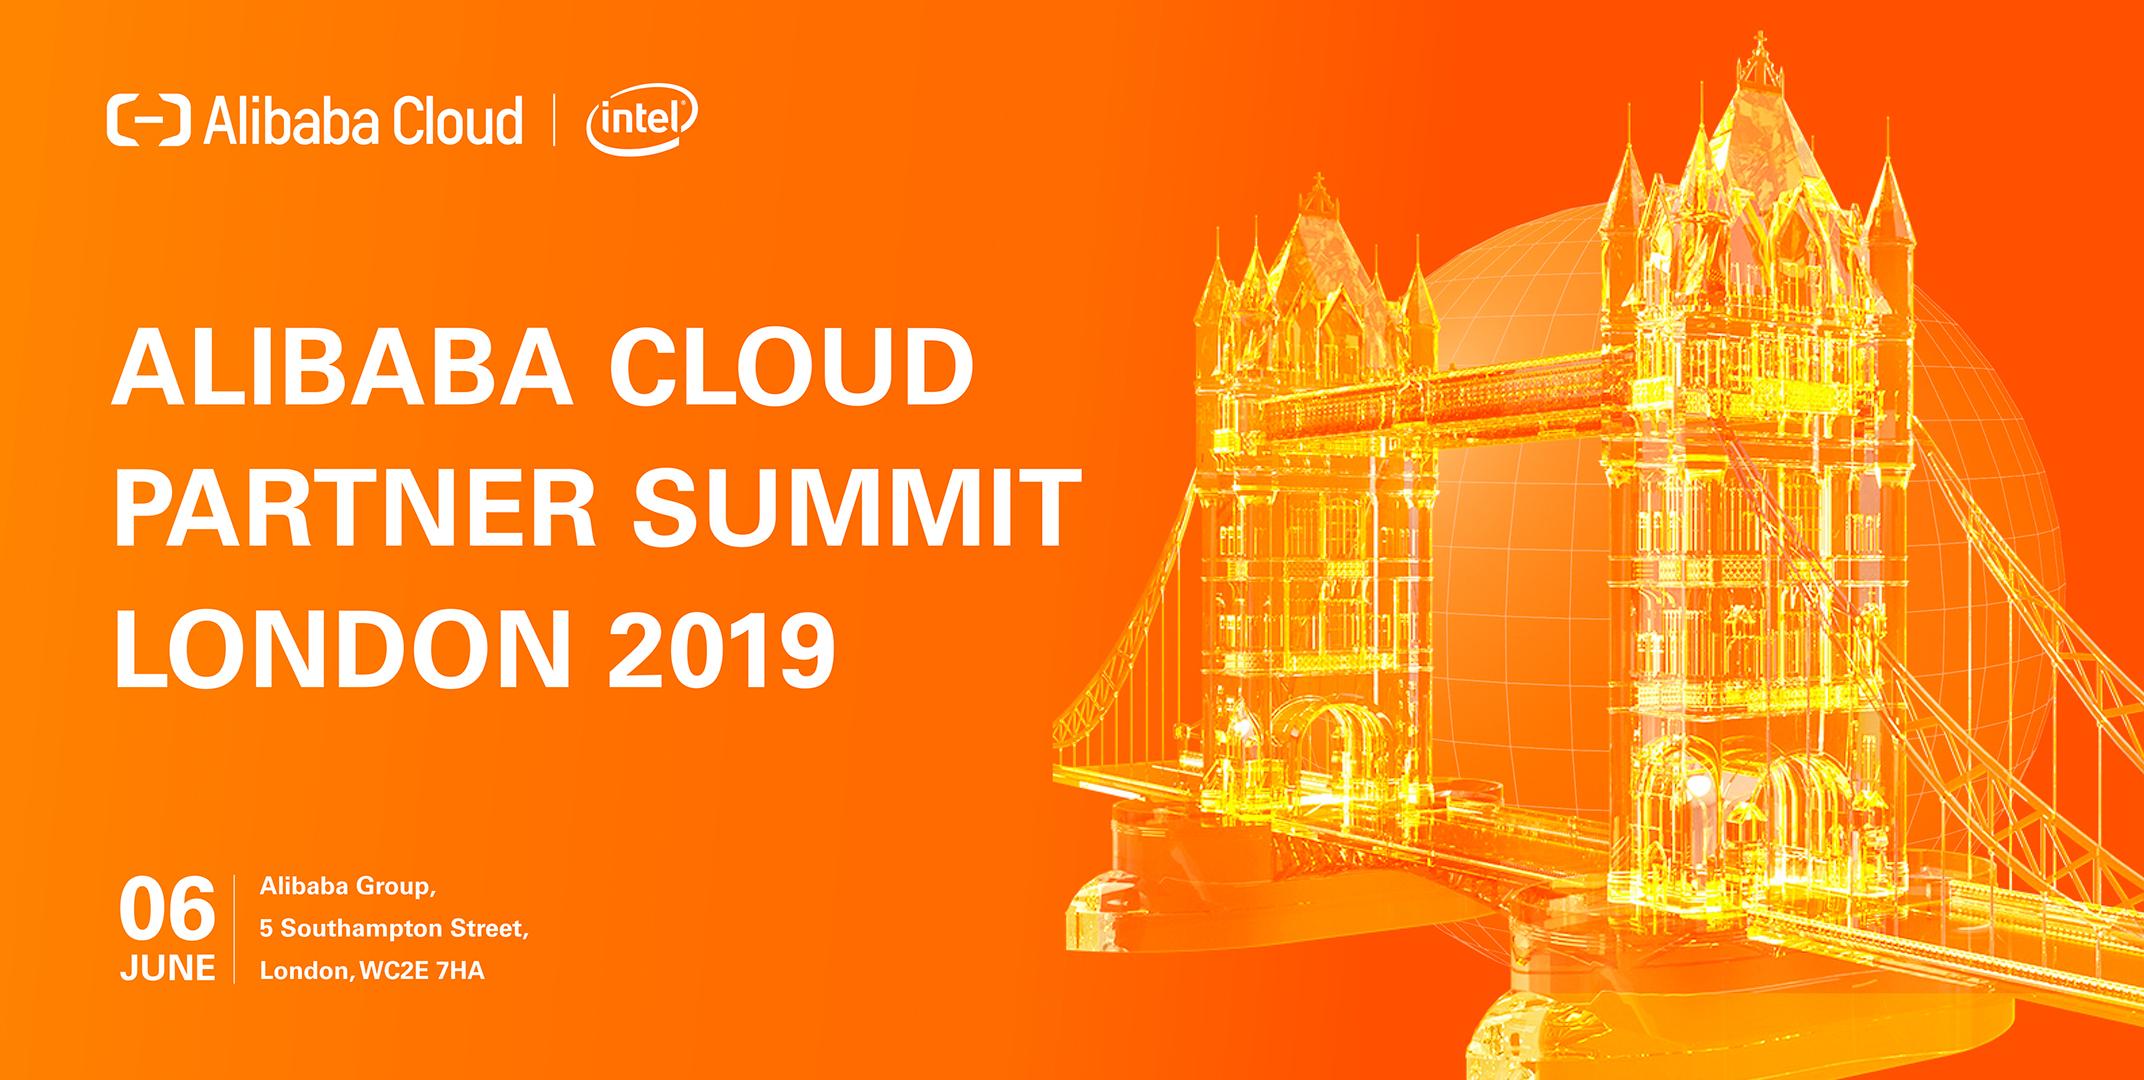 Alibaba Cloud Partner Summit London 2019